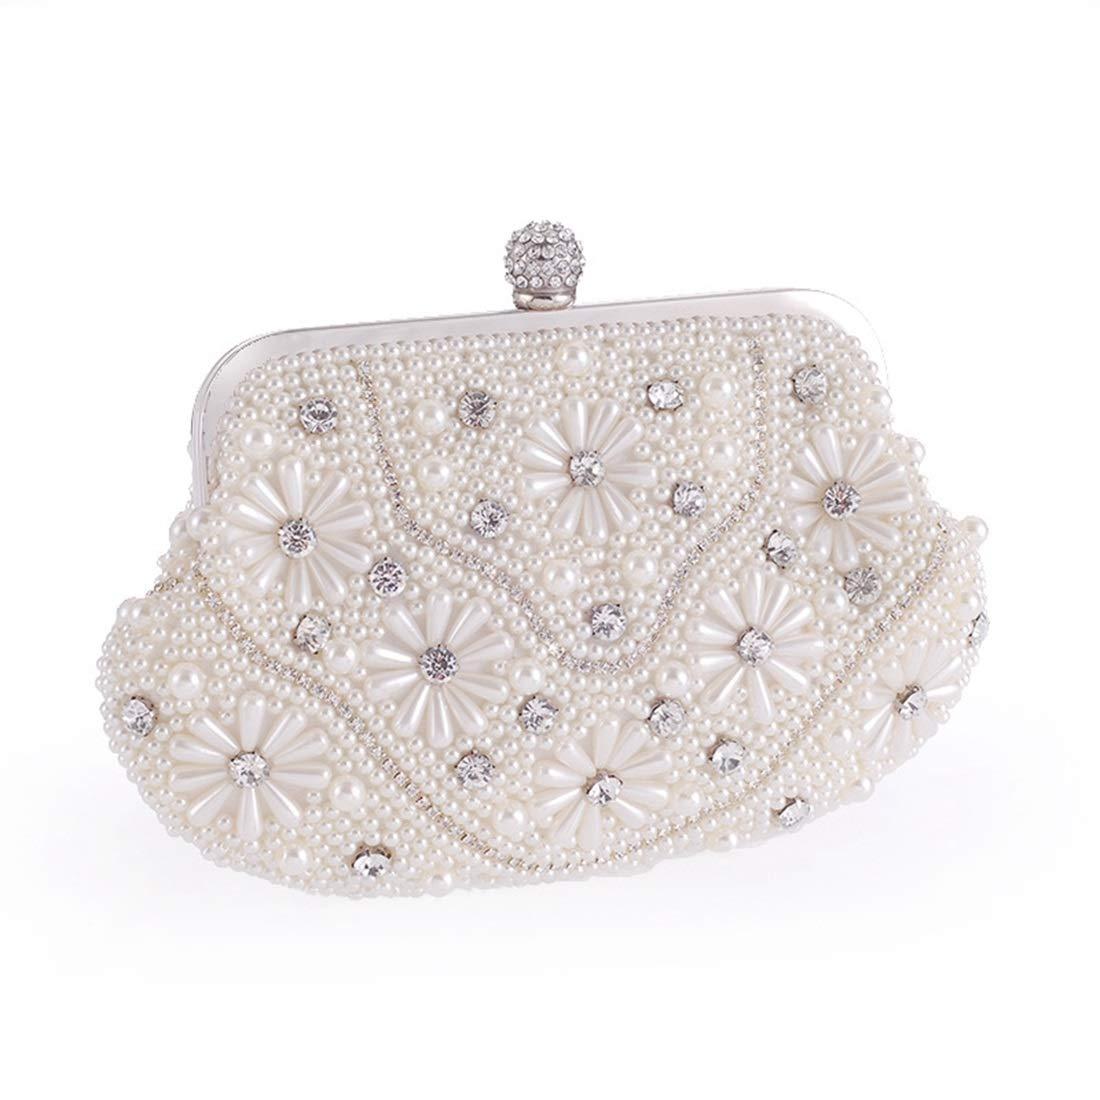 Color : White QARYYQ New Womens Bag Fashion Pearl Evening Party Bride Bag Wedding Bag Hand Chain Shoulder Bag Evening Package